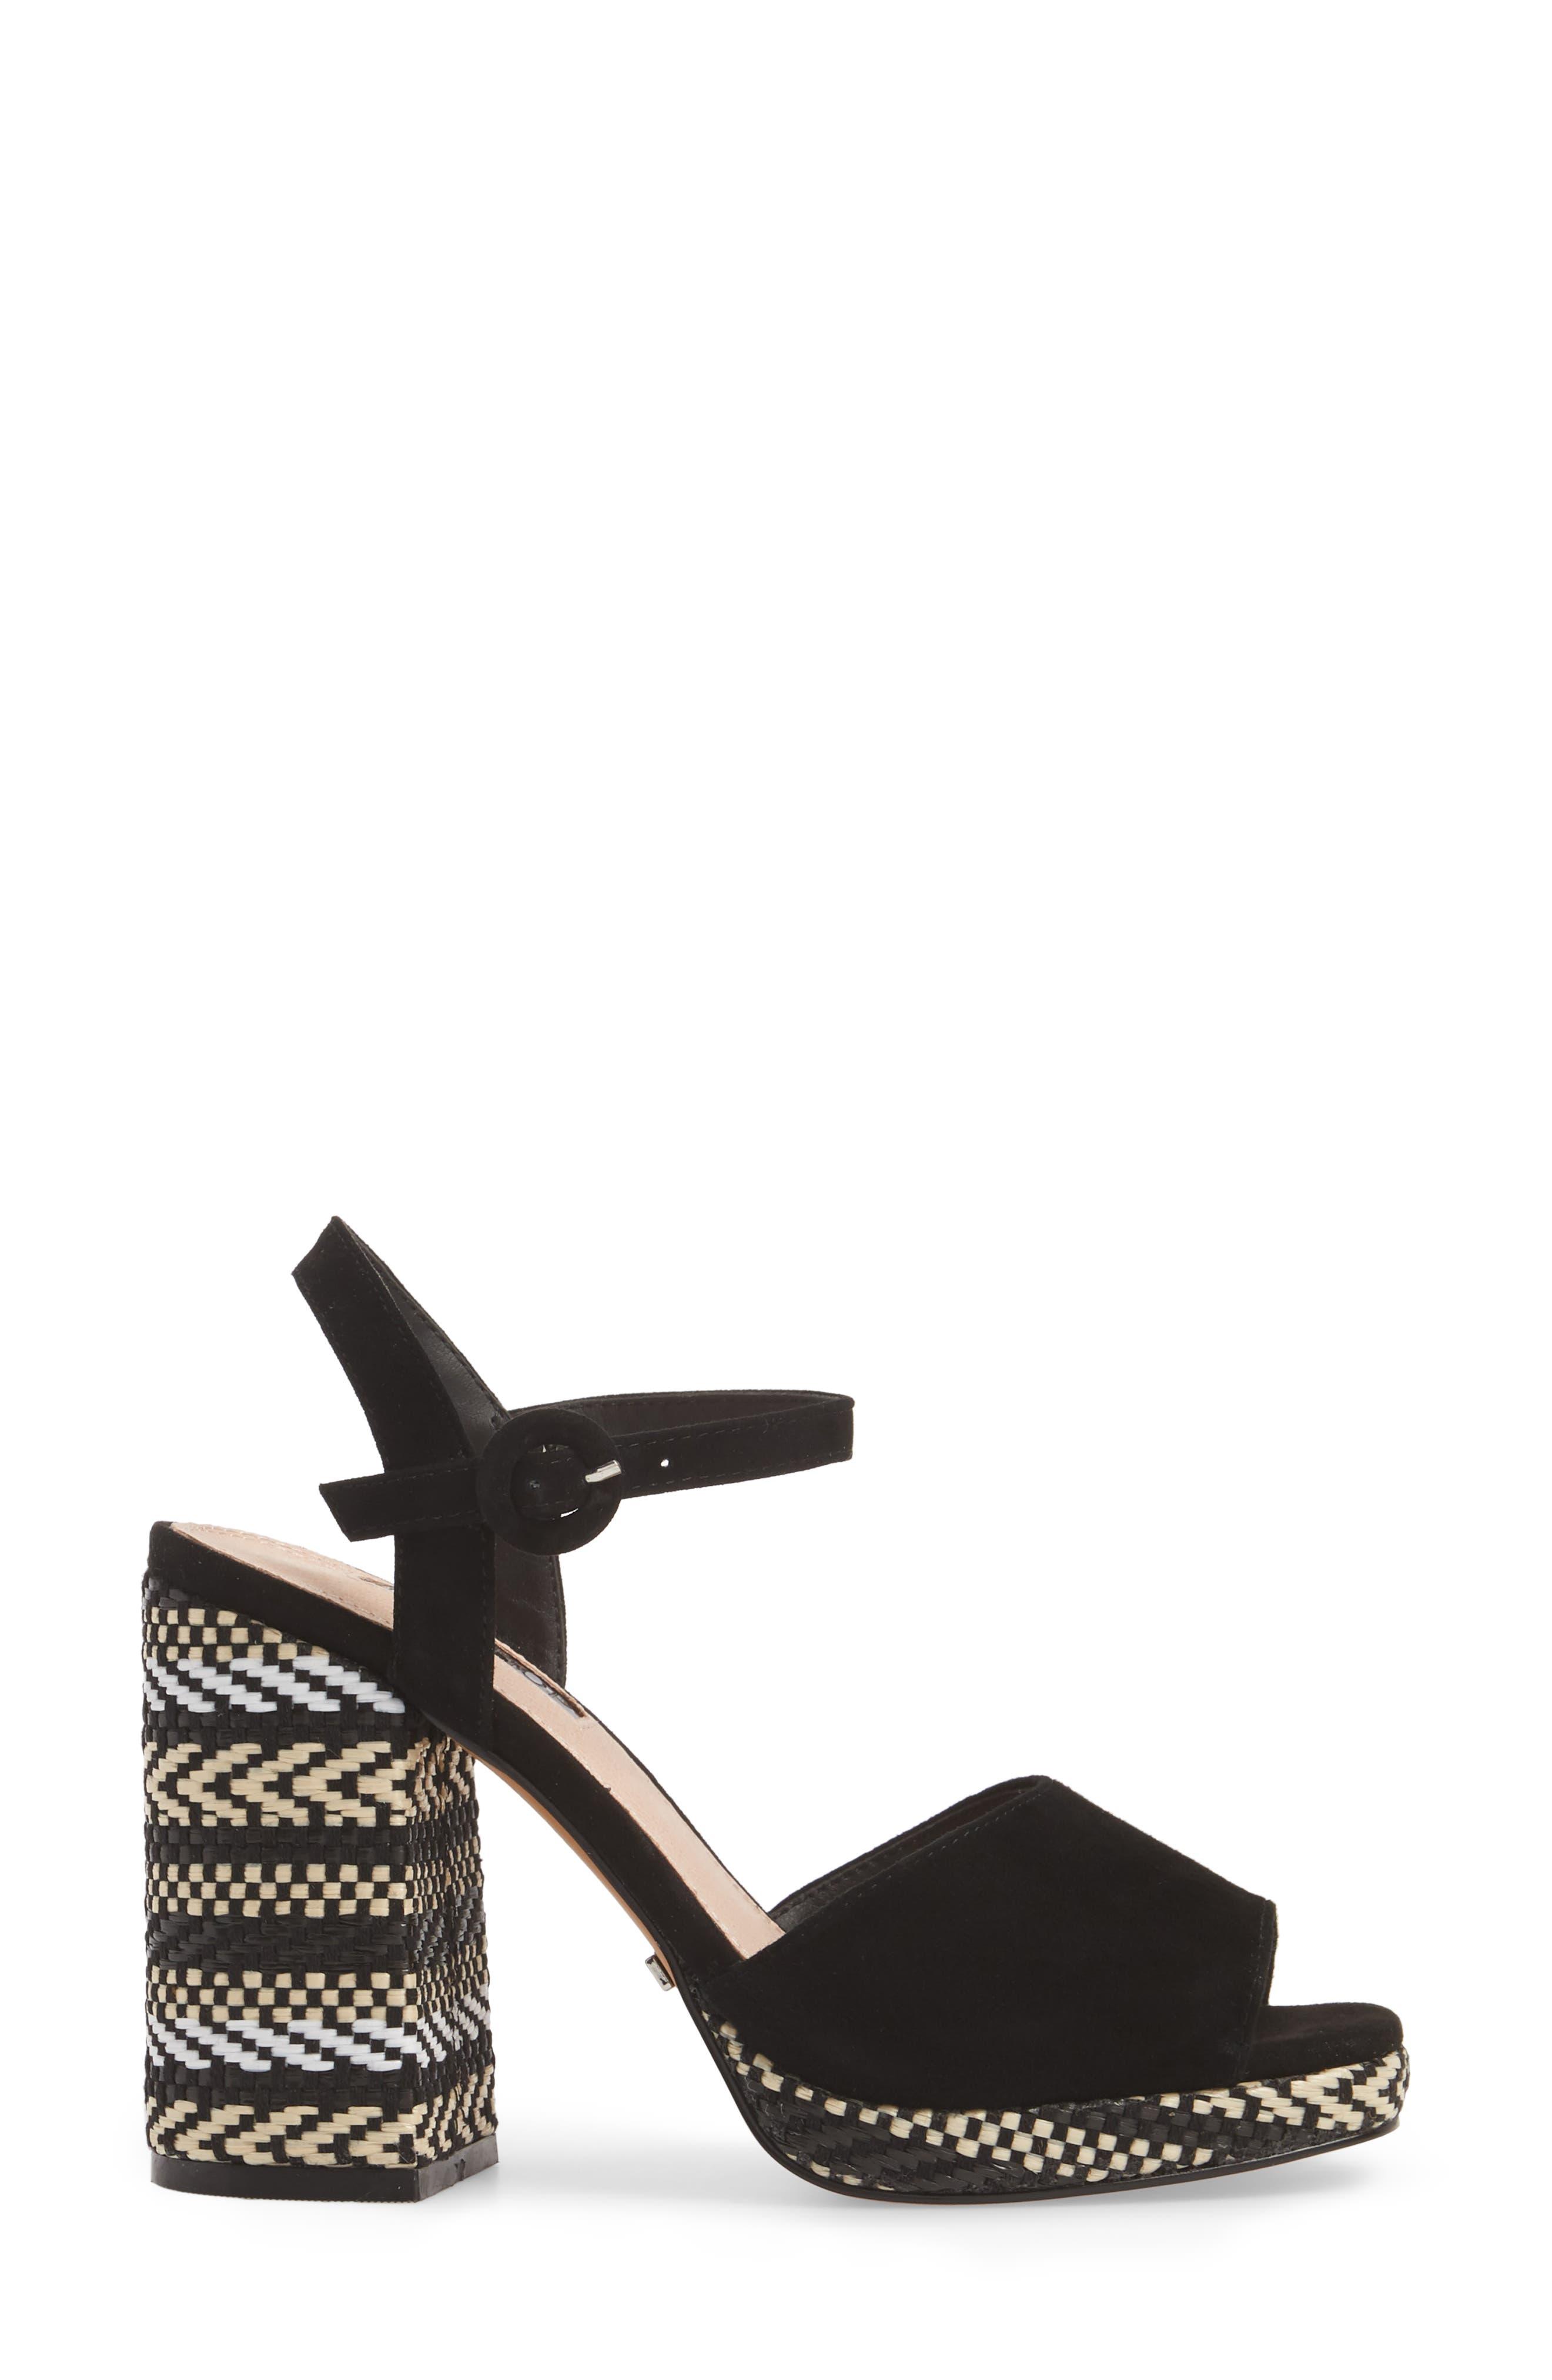 Laura Woven Block Heel Sandal,                             Alternate thumbnail 3, color,                             Black Multi